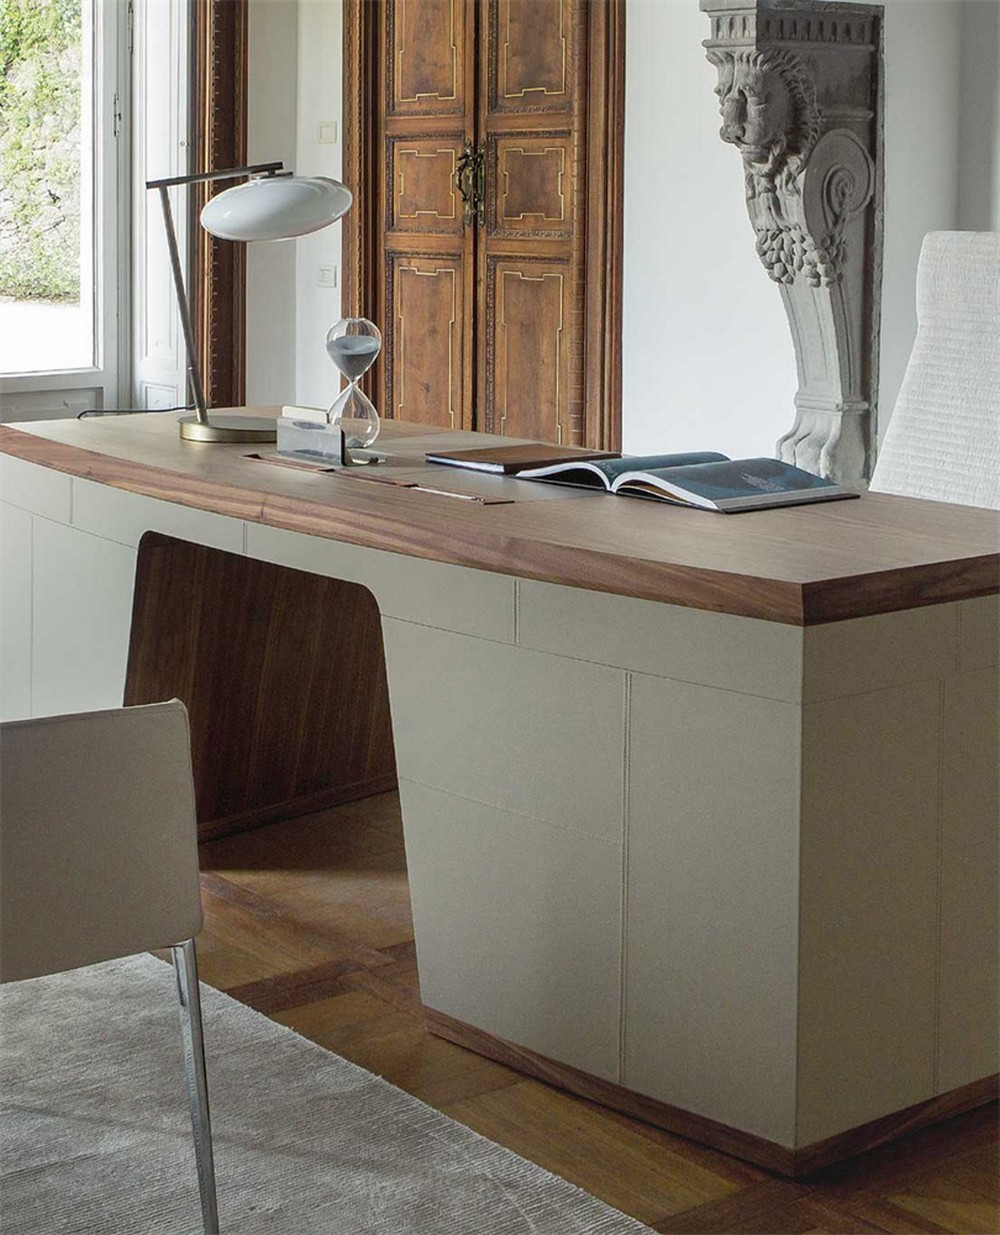 luxury desks Top 25 Luxury Desks to Modernize Your Home Office Decor Top 25 Luxury Desks to Modernize Your Home Office Decor 14